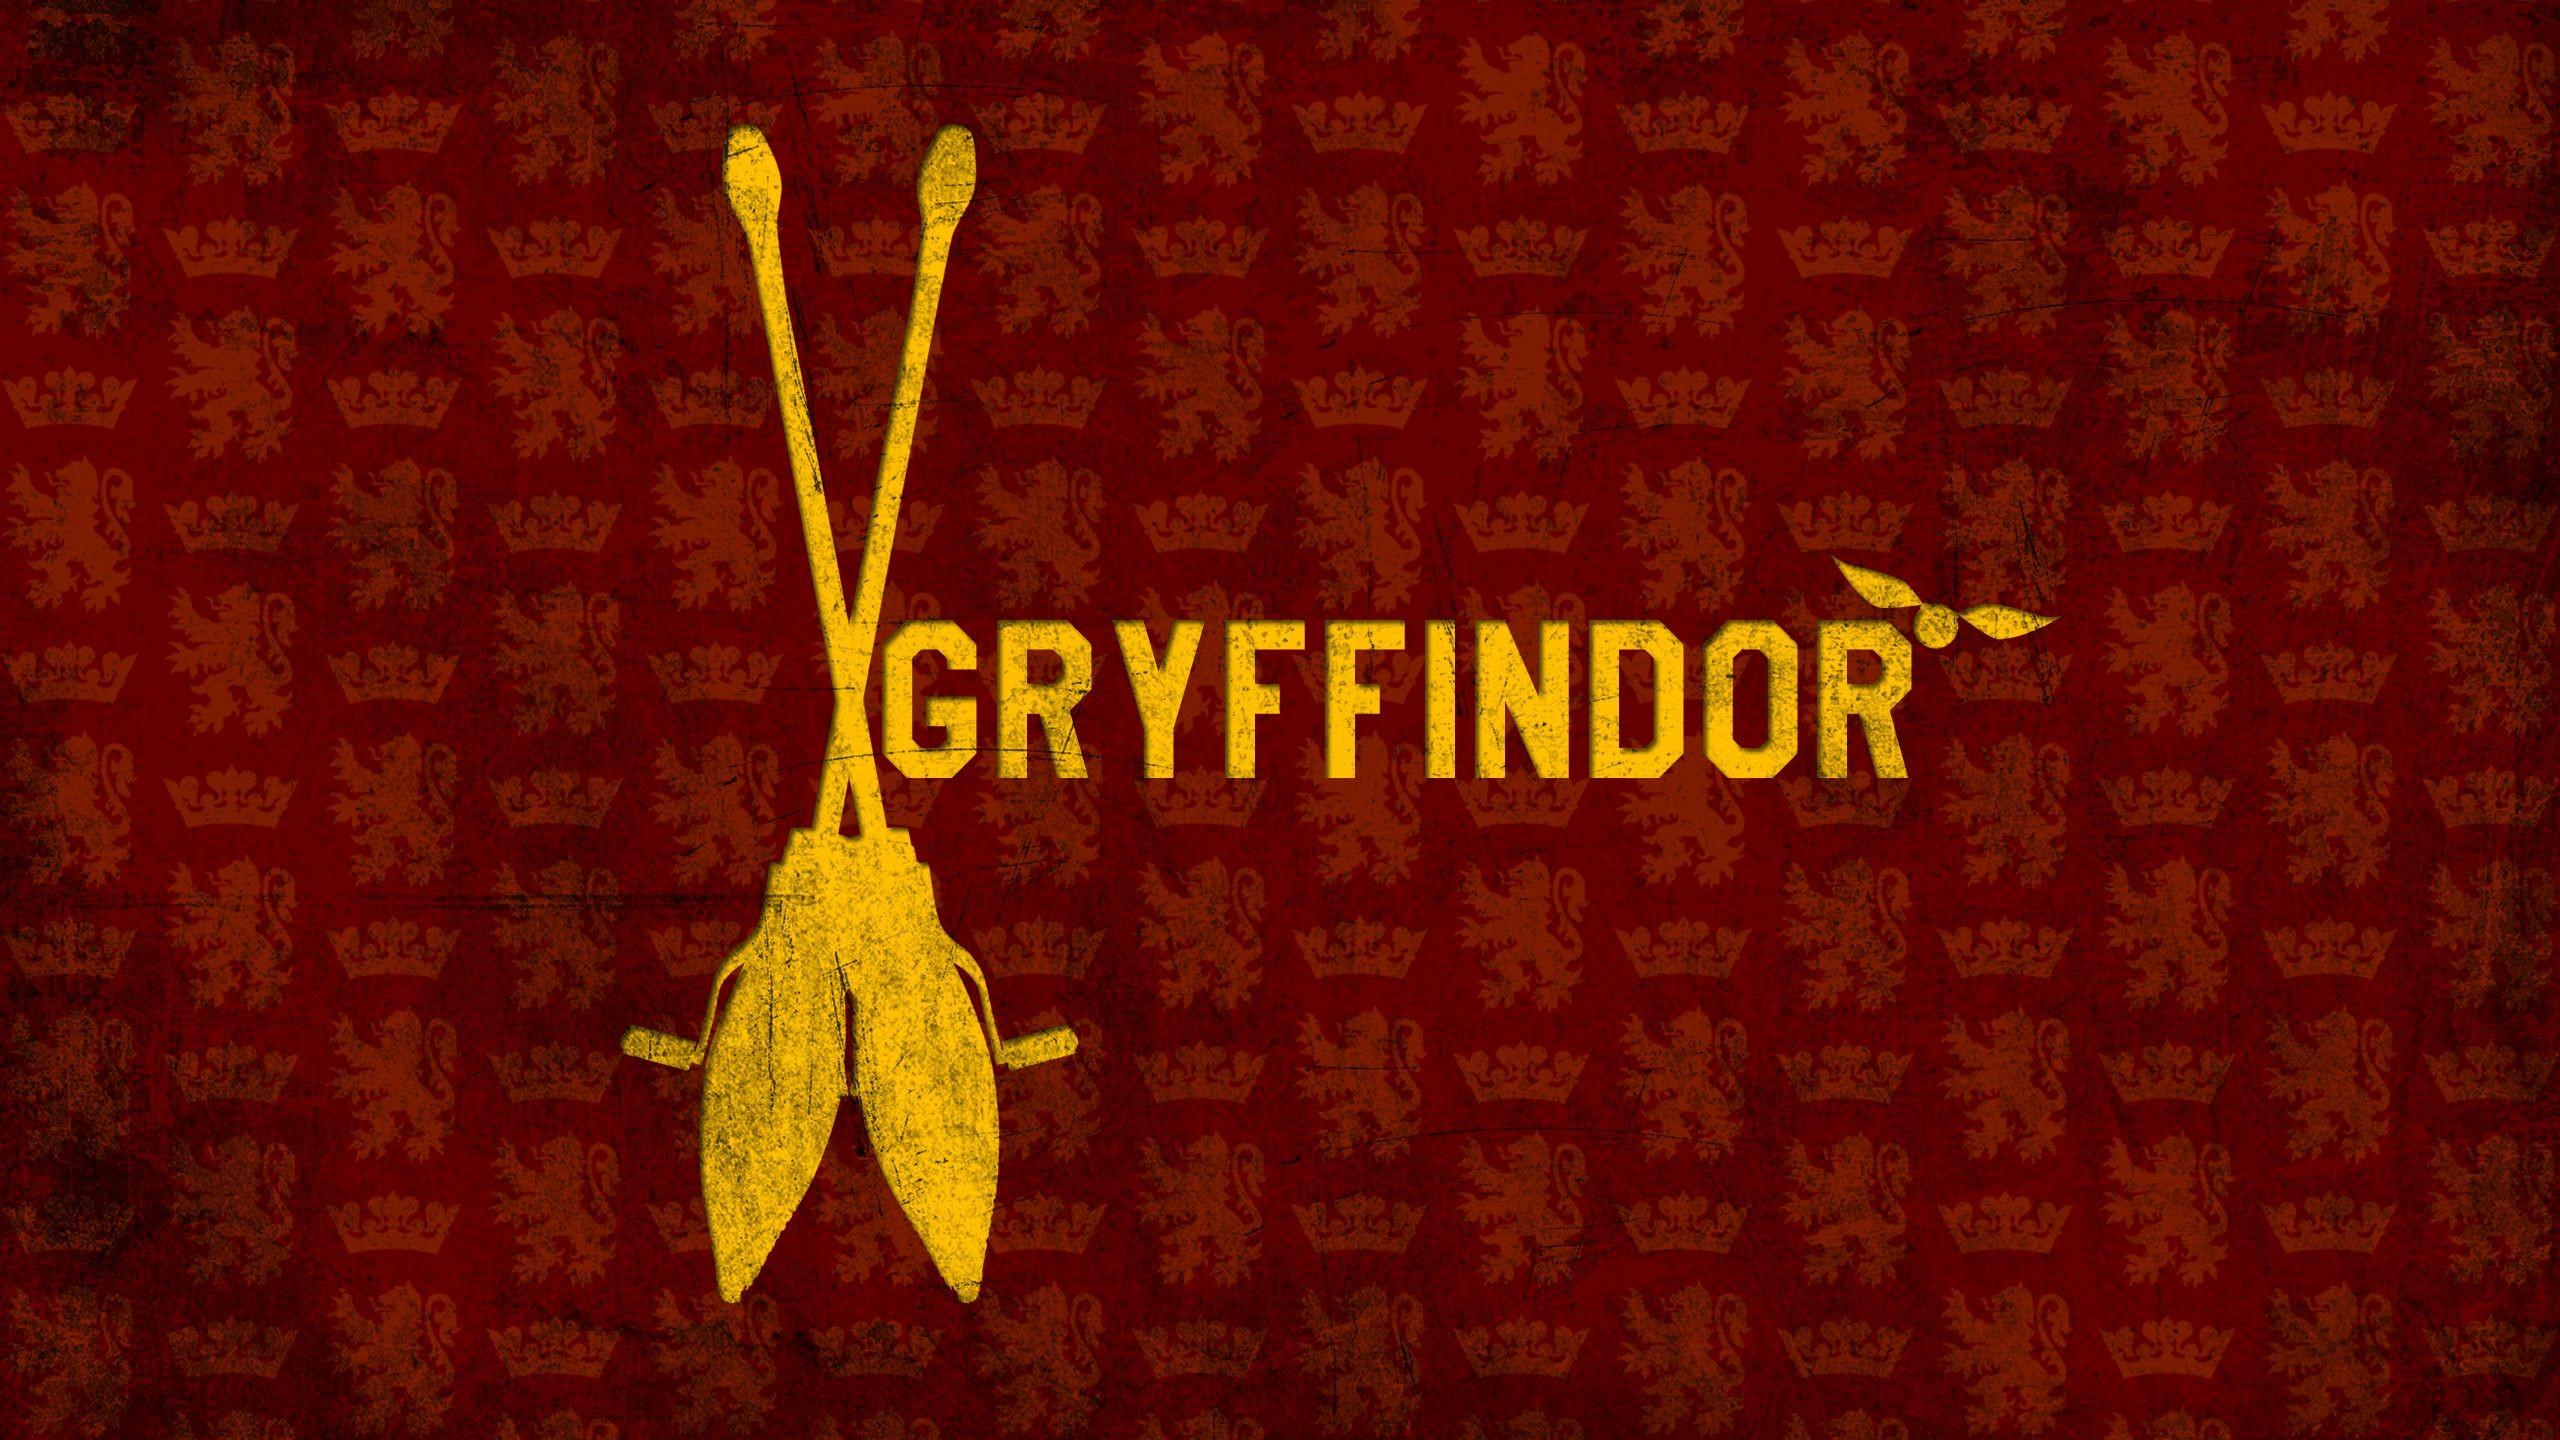 Wallpaper Backgrounds, Wallpapers, Harry Potter Wallpaper